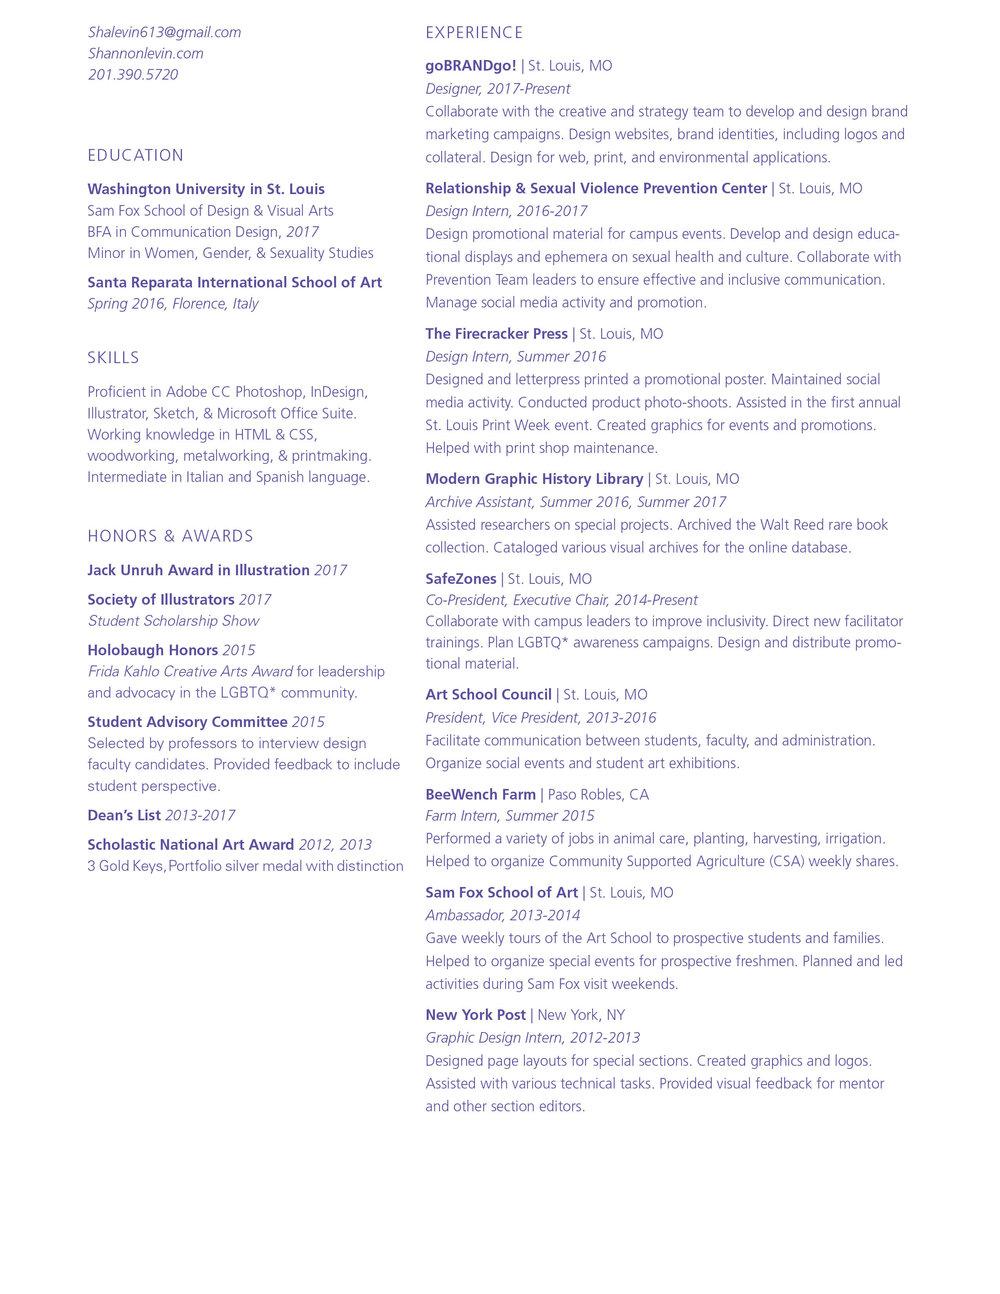 Levin_resume_12.25.18.jpg